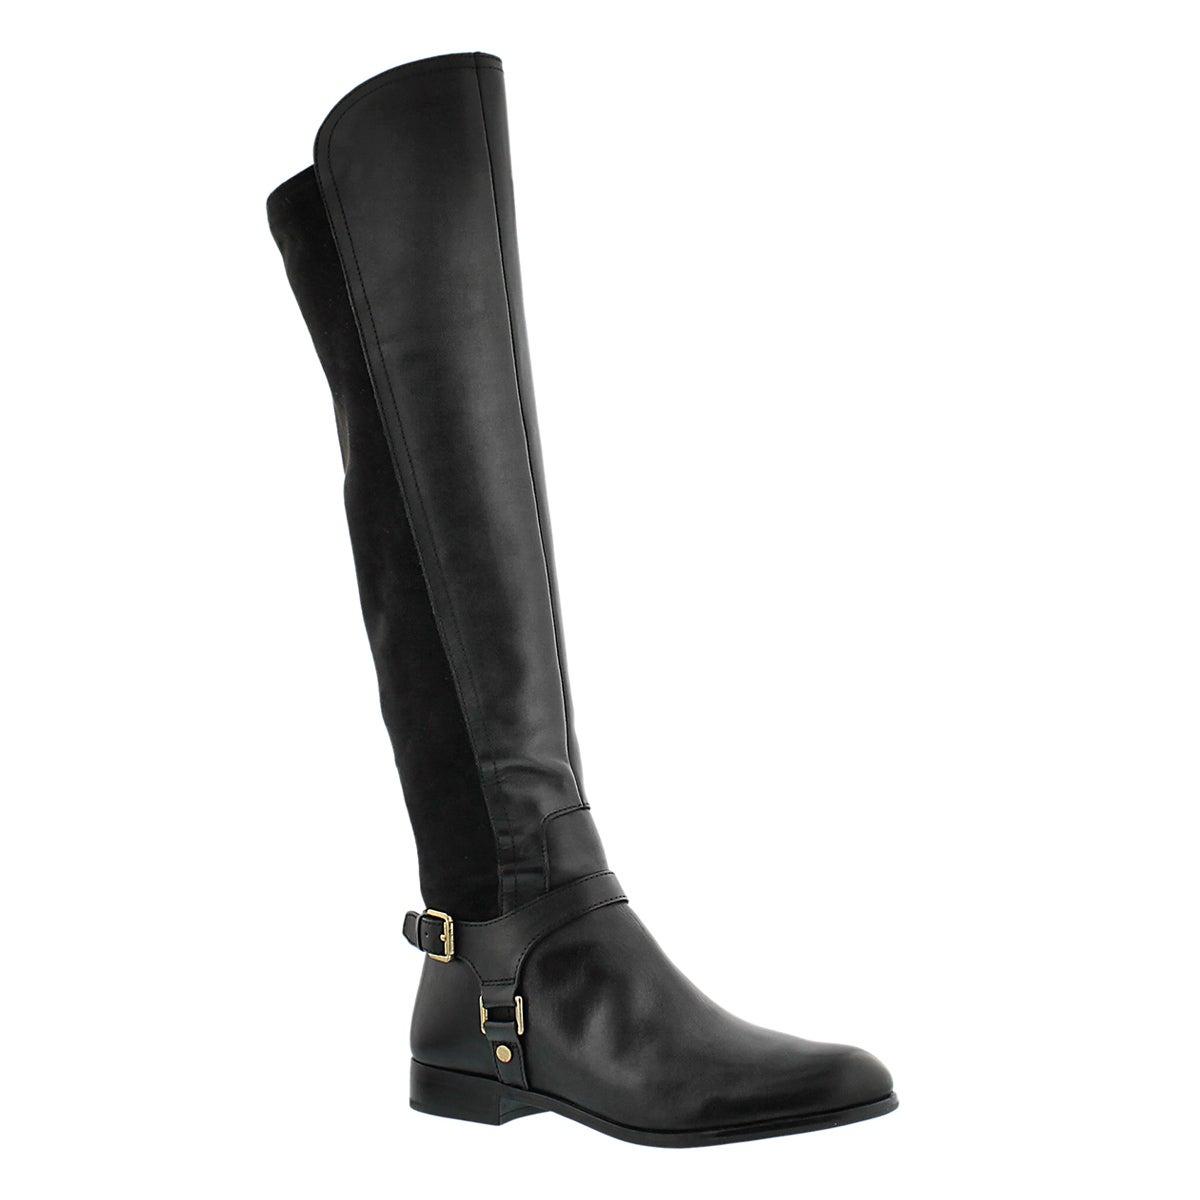 Lds Mast blk tall riding boot